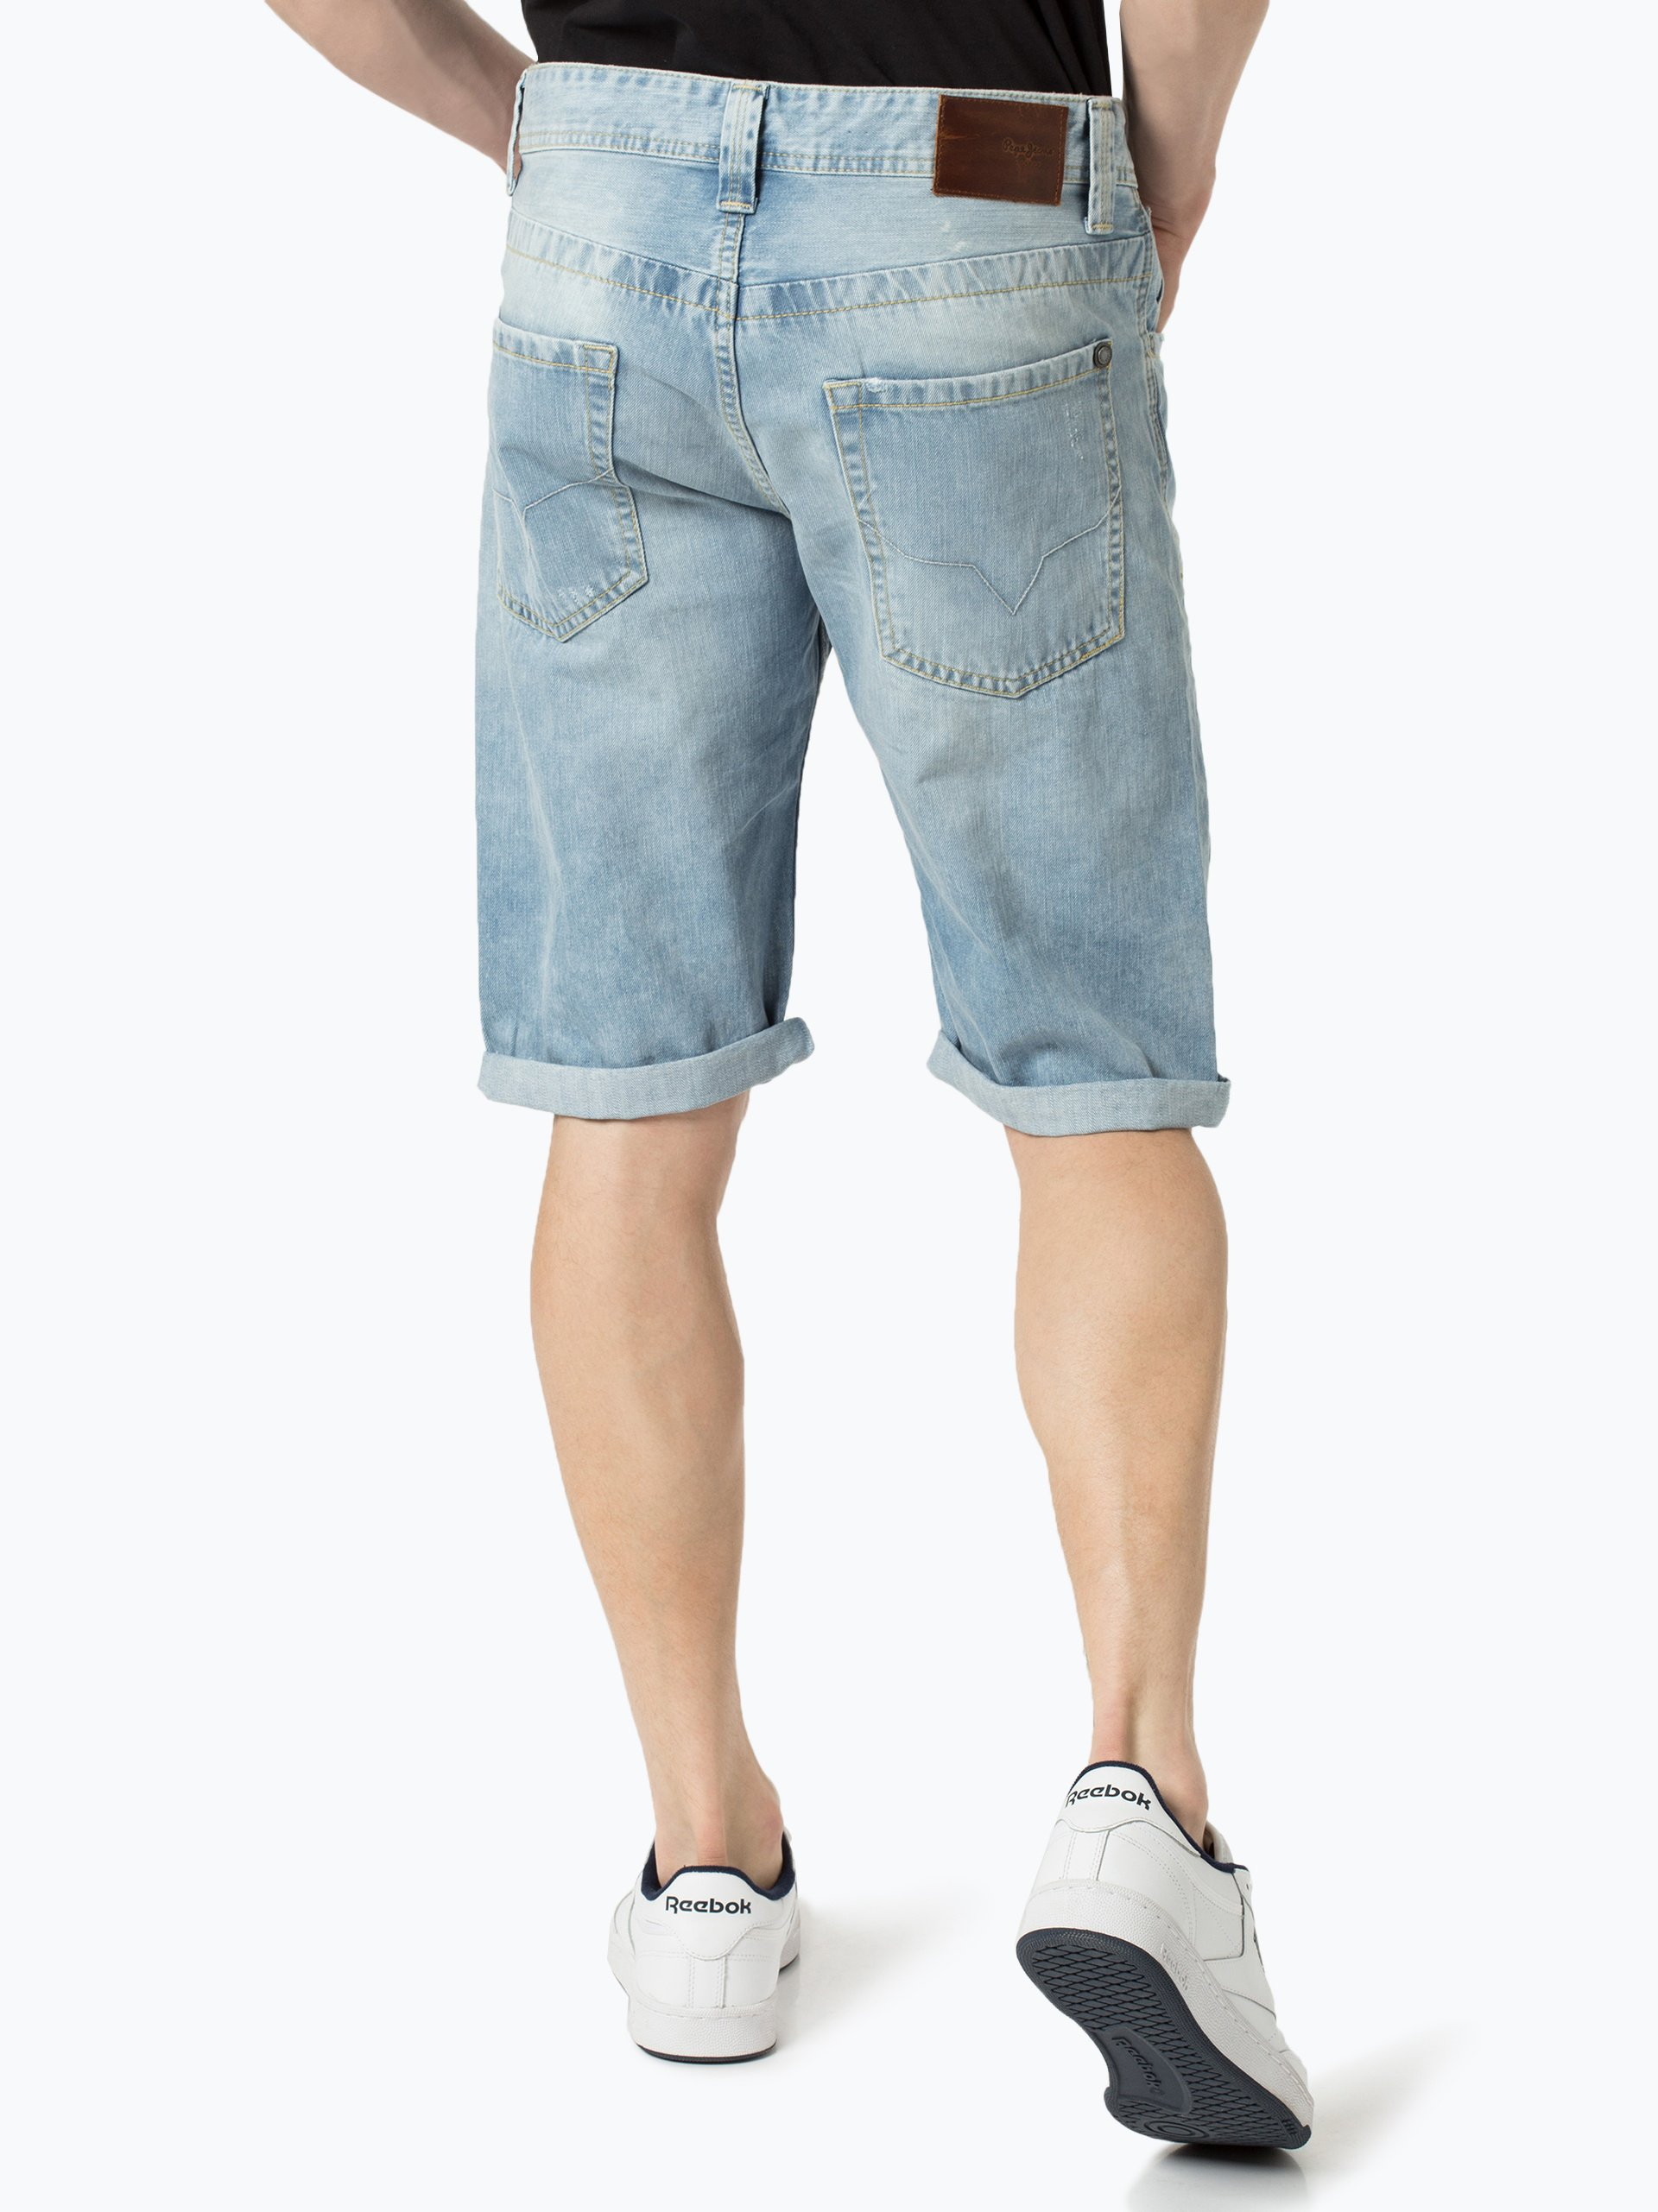 Pepe Jeans Herren Jeansshorts - Cash